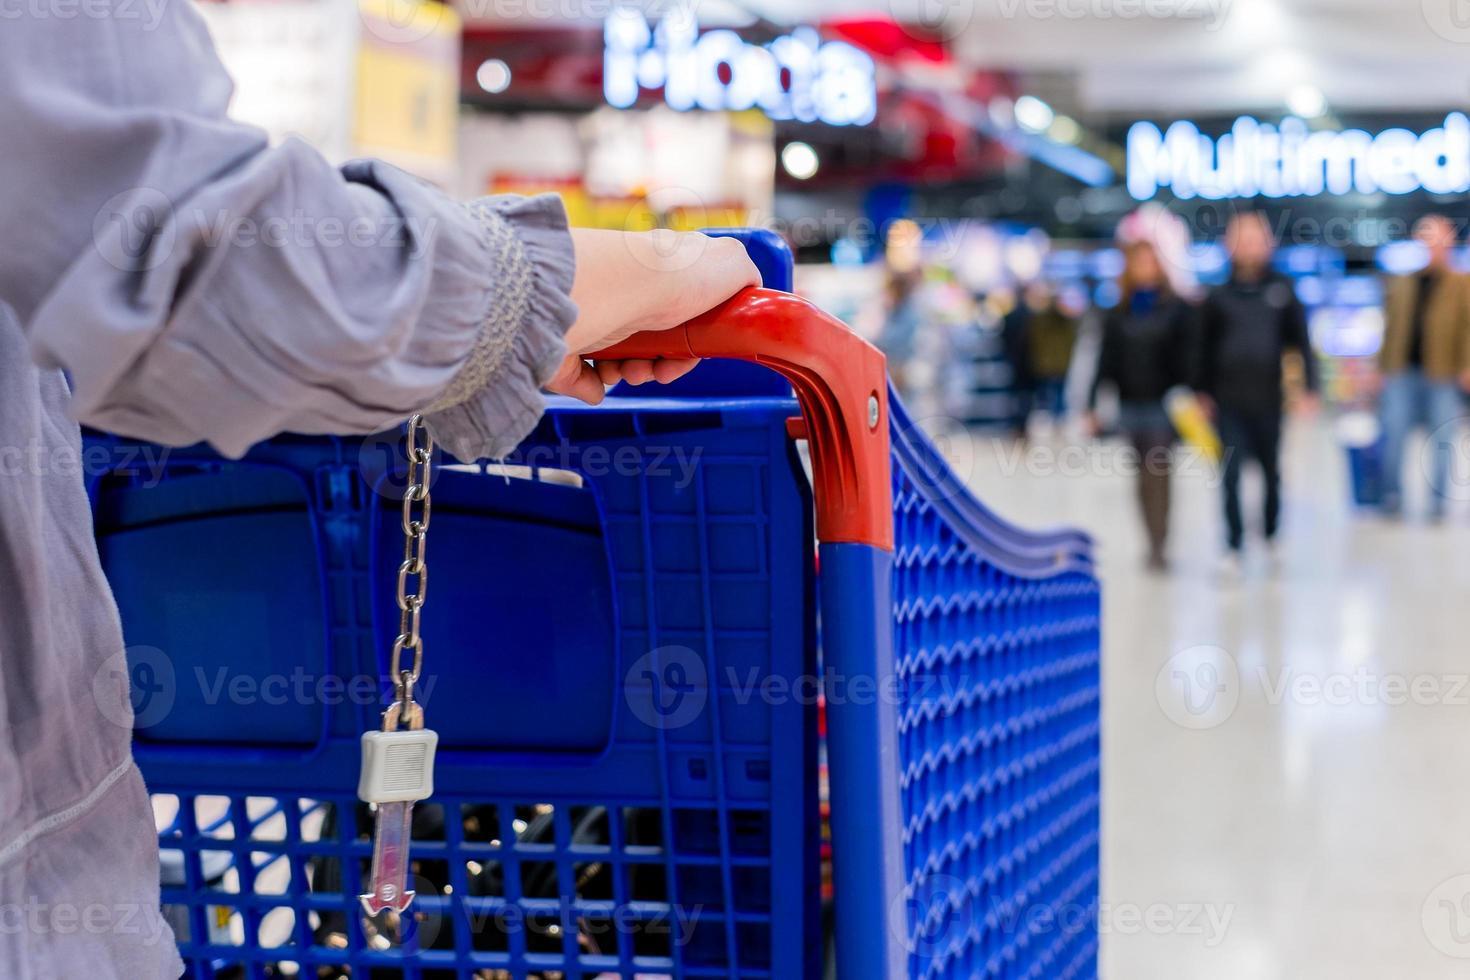 Shopping cart photo